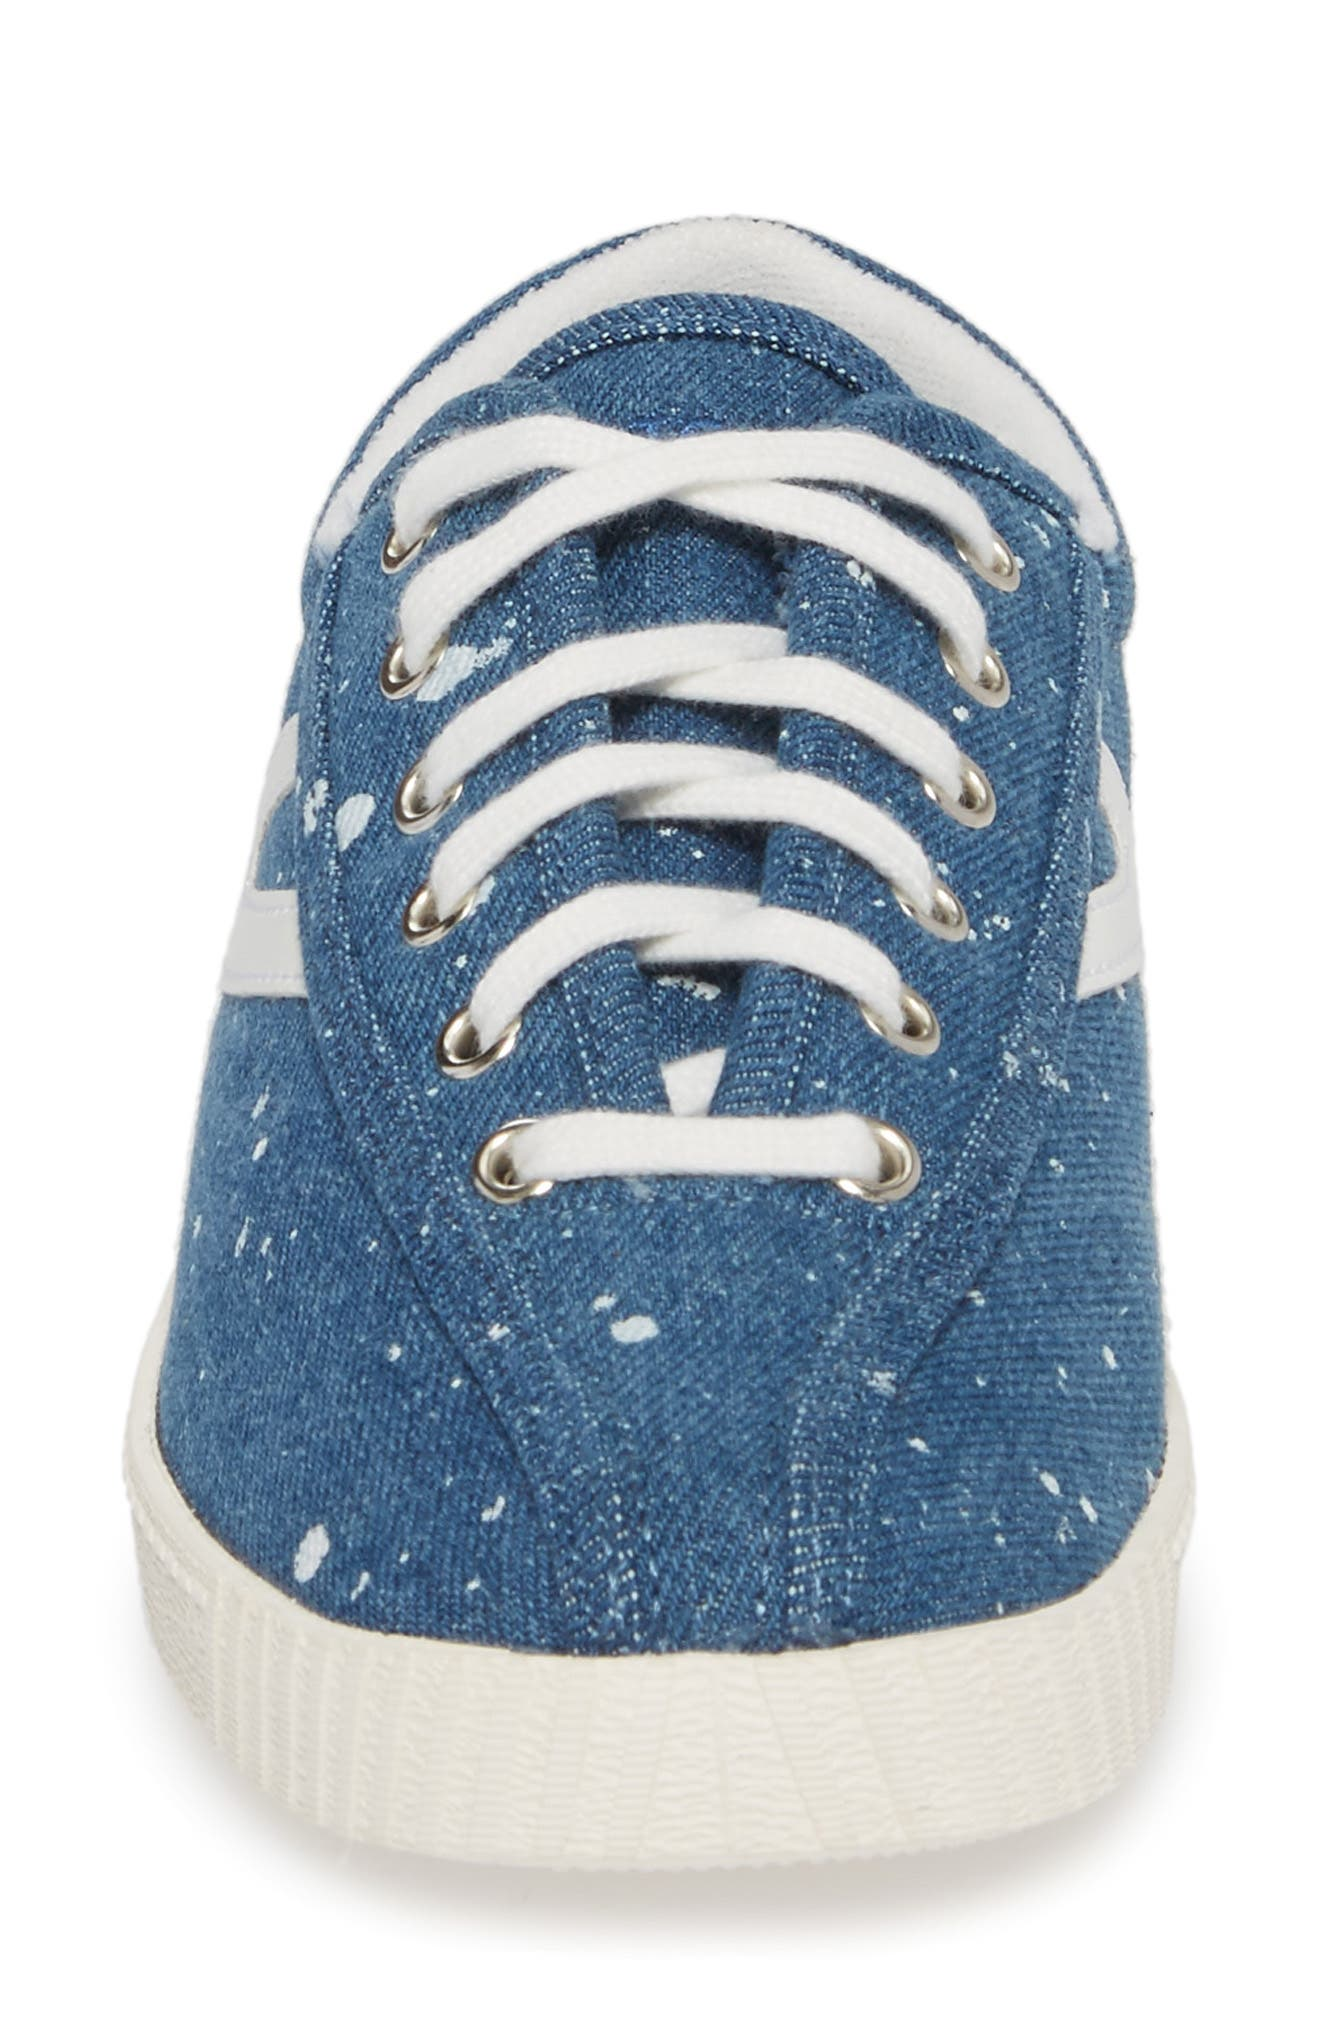 Nylite Plus Sneaker,                             Alternate thumbnail 4, color,                             Blue Fabric